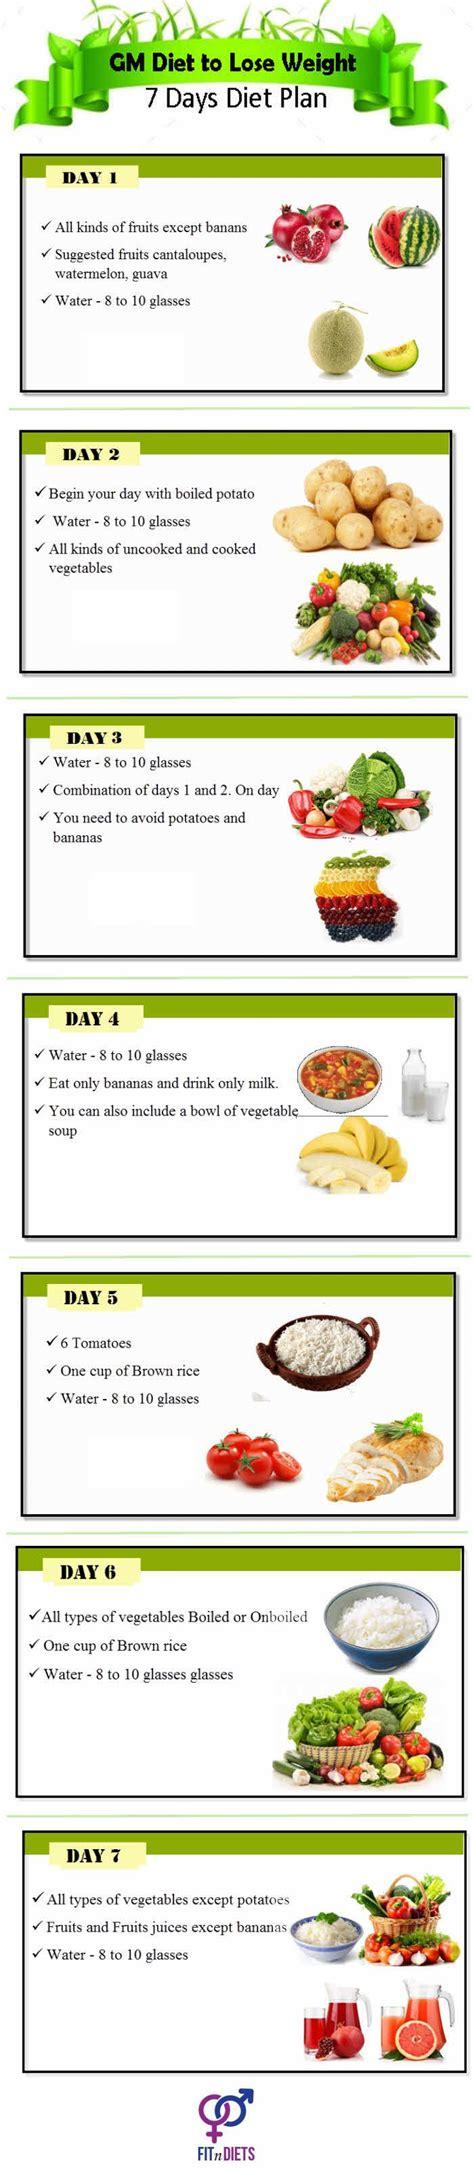 great countdown calendar printable weight loss calendar 11 tips for